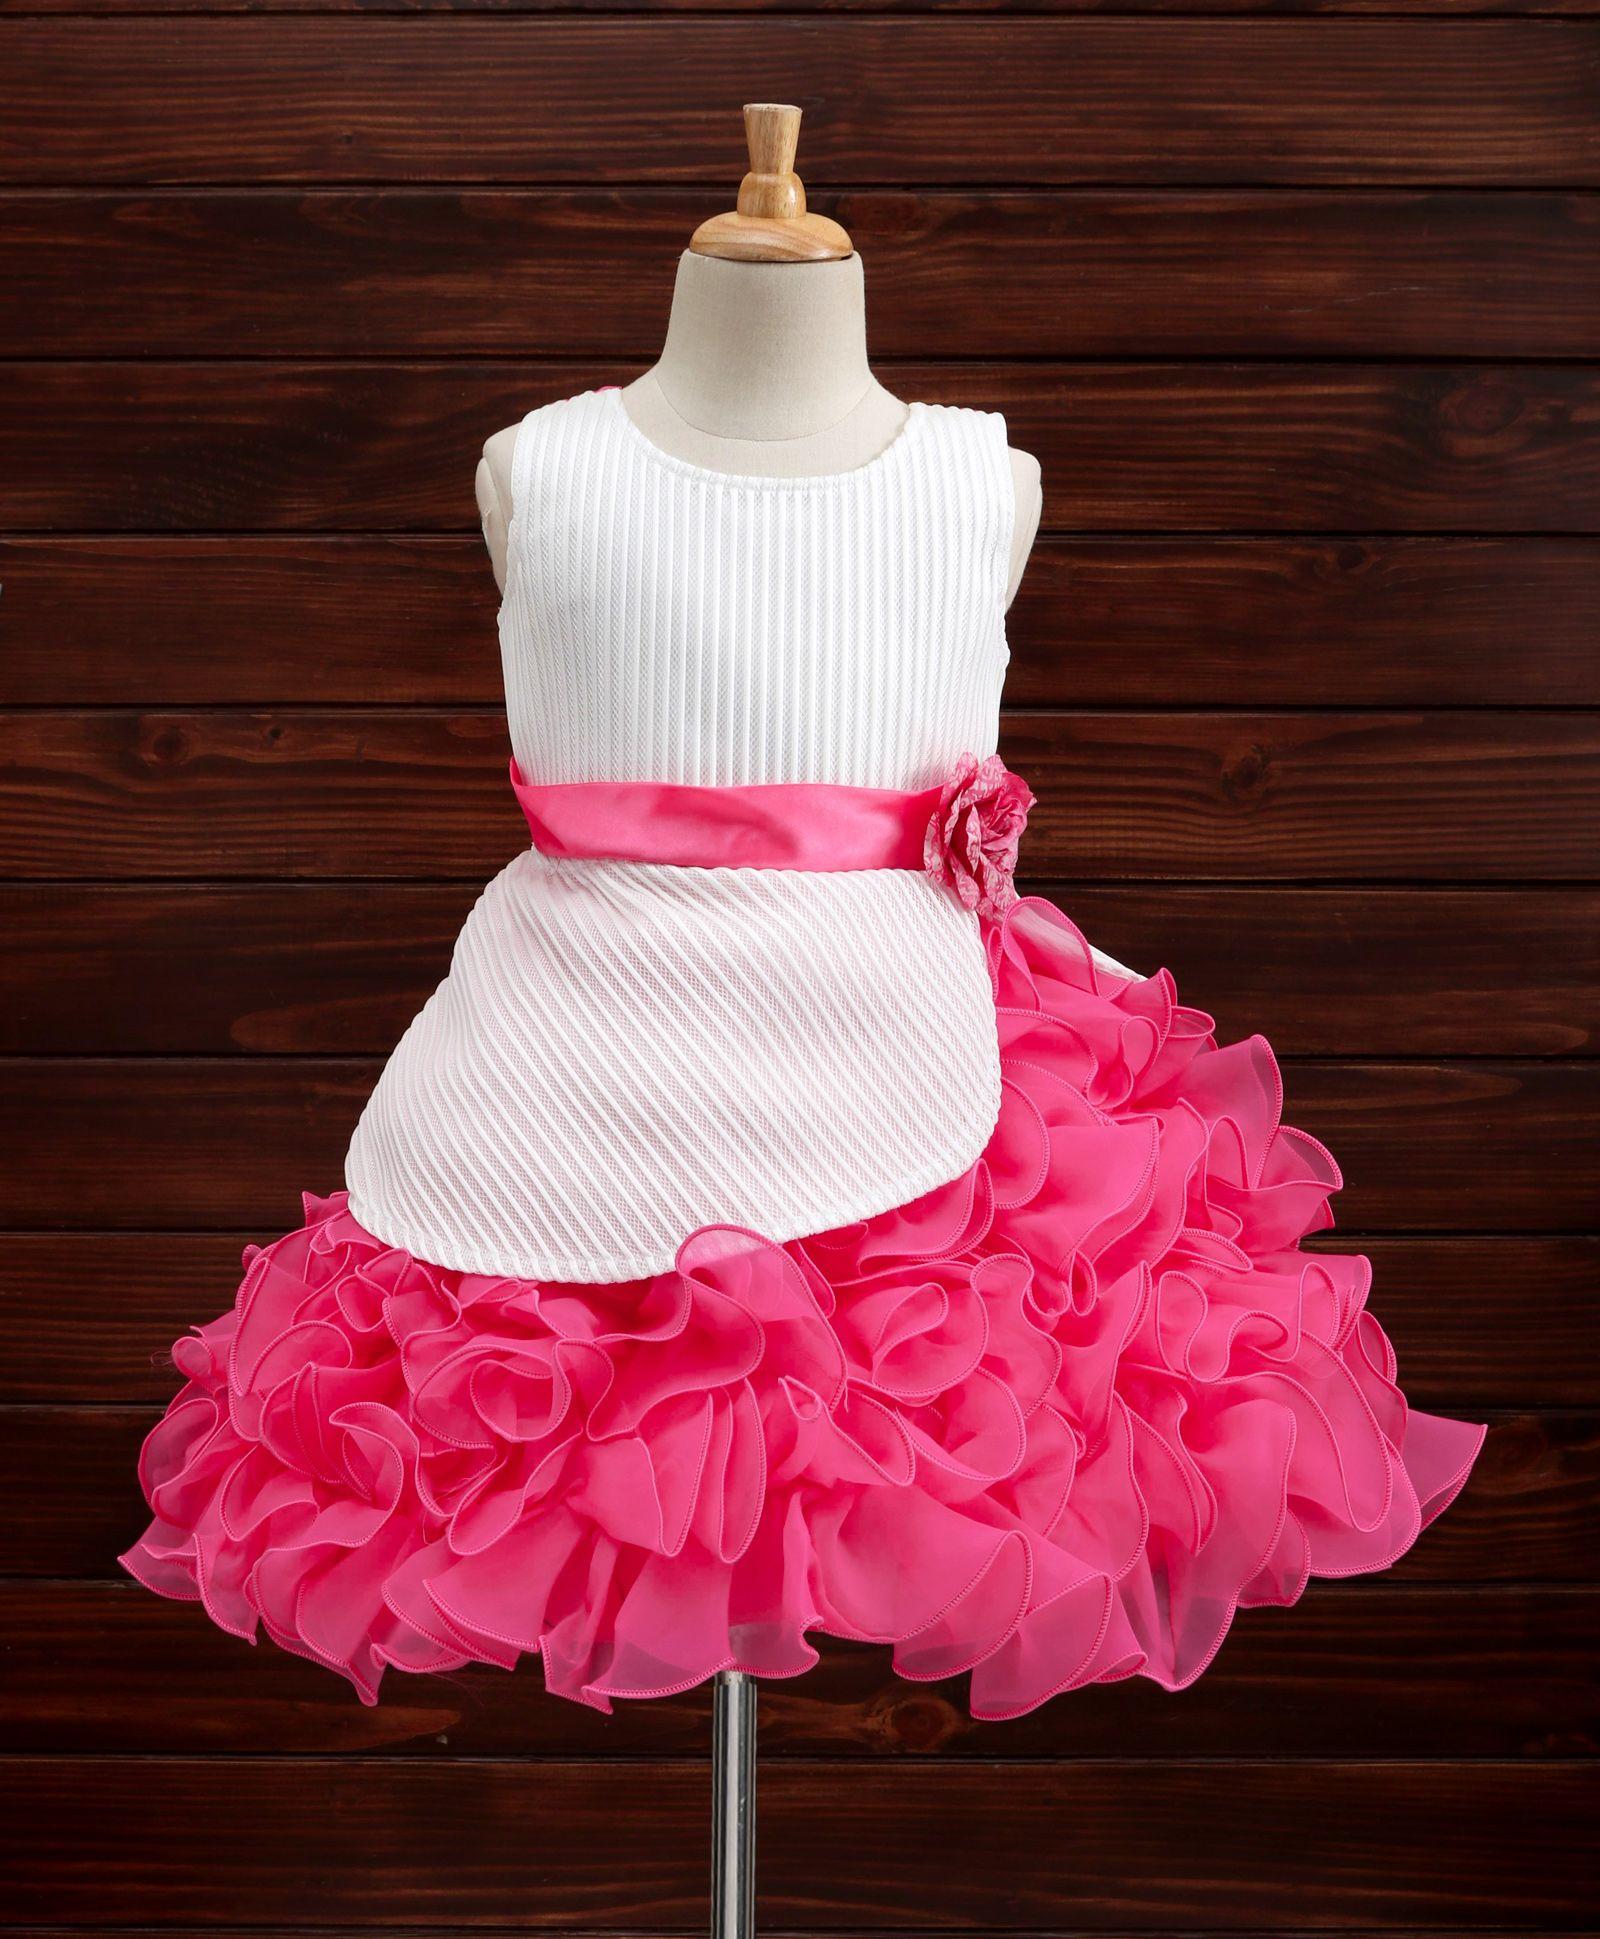 375befeff64b4 Buy Maalka Sleeveless Ruffle Dress Dark Pink for Girls (4-5 Years) Online  in India, Shop at FirstCry.com - 2229953